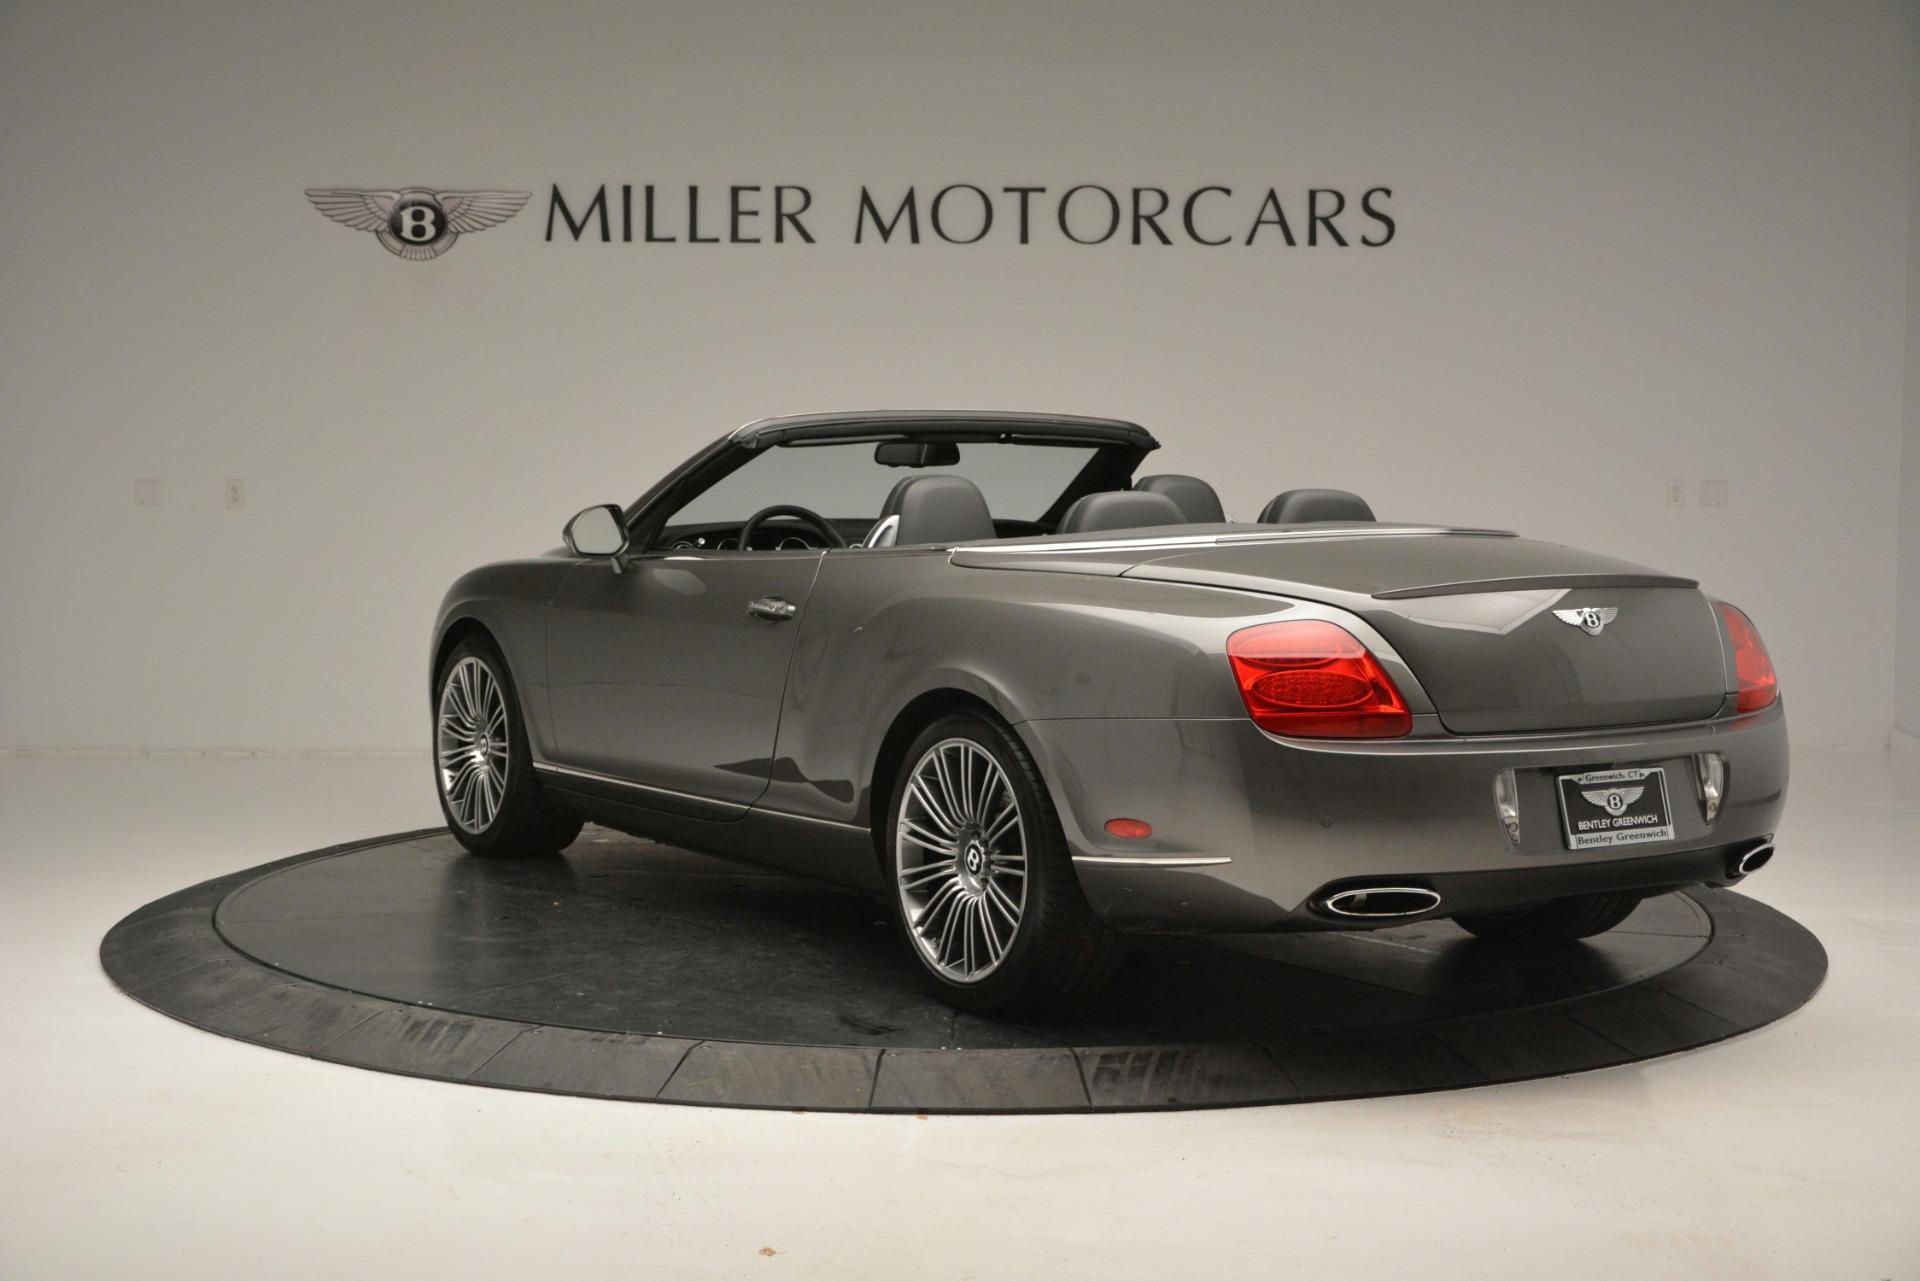 Used 2010 Bentley Continental GT Speed For Sale In Westport, CT 2677_p4